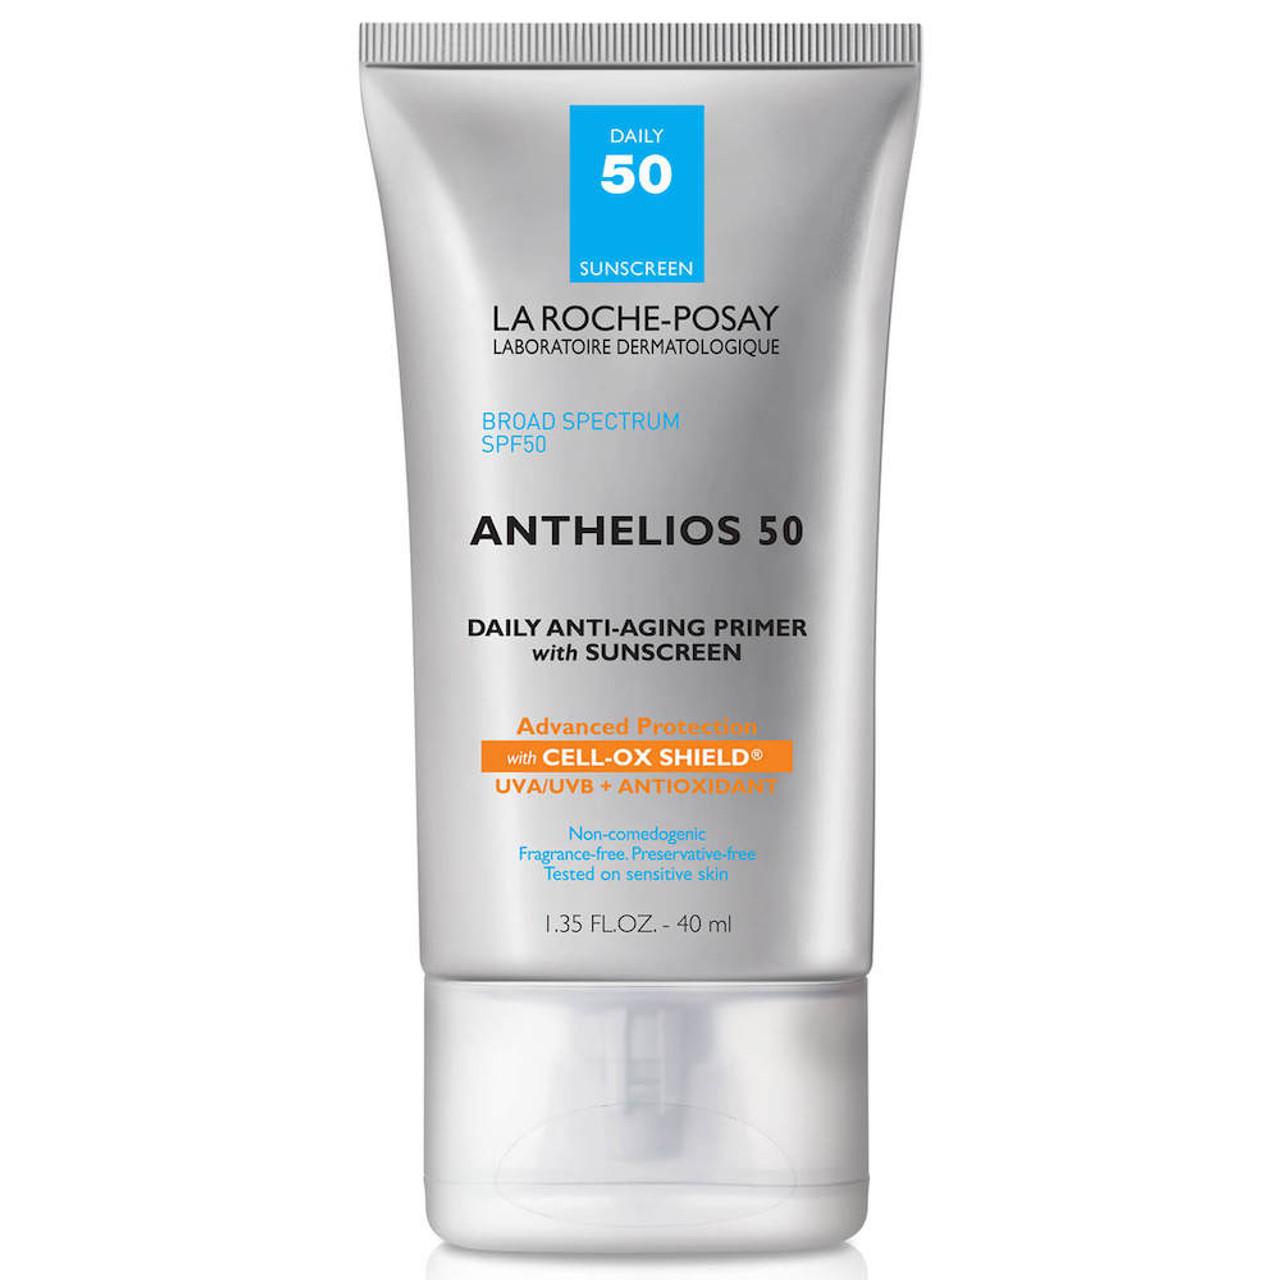 La Roche Posay Anthelios Anti-Aging Face Primer SPF 50 BeautifiedYou.com